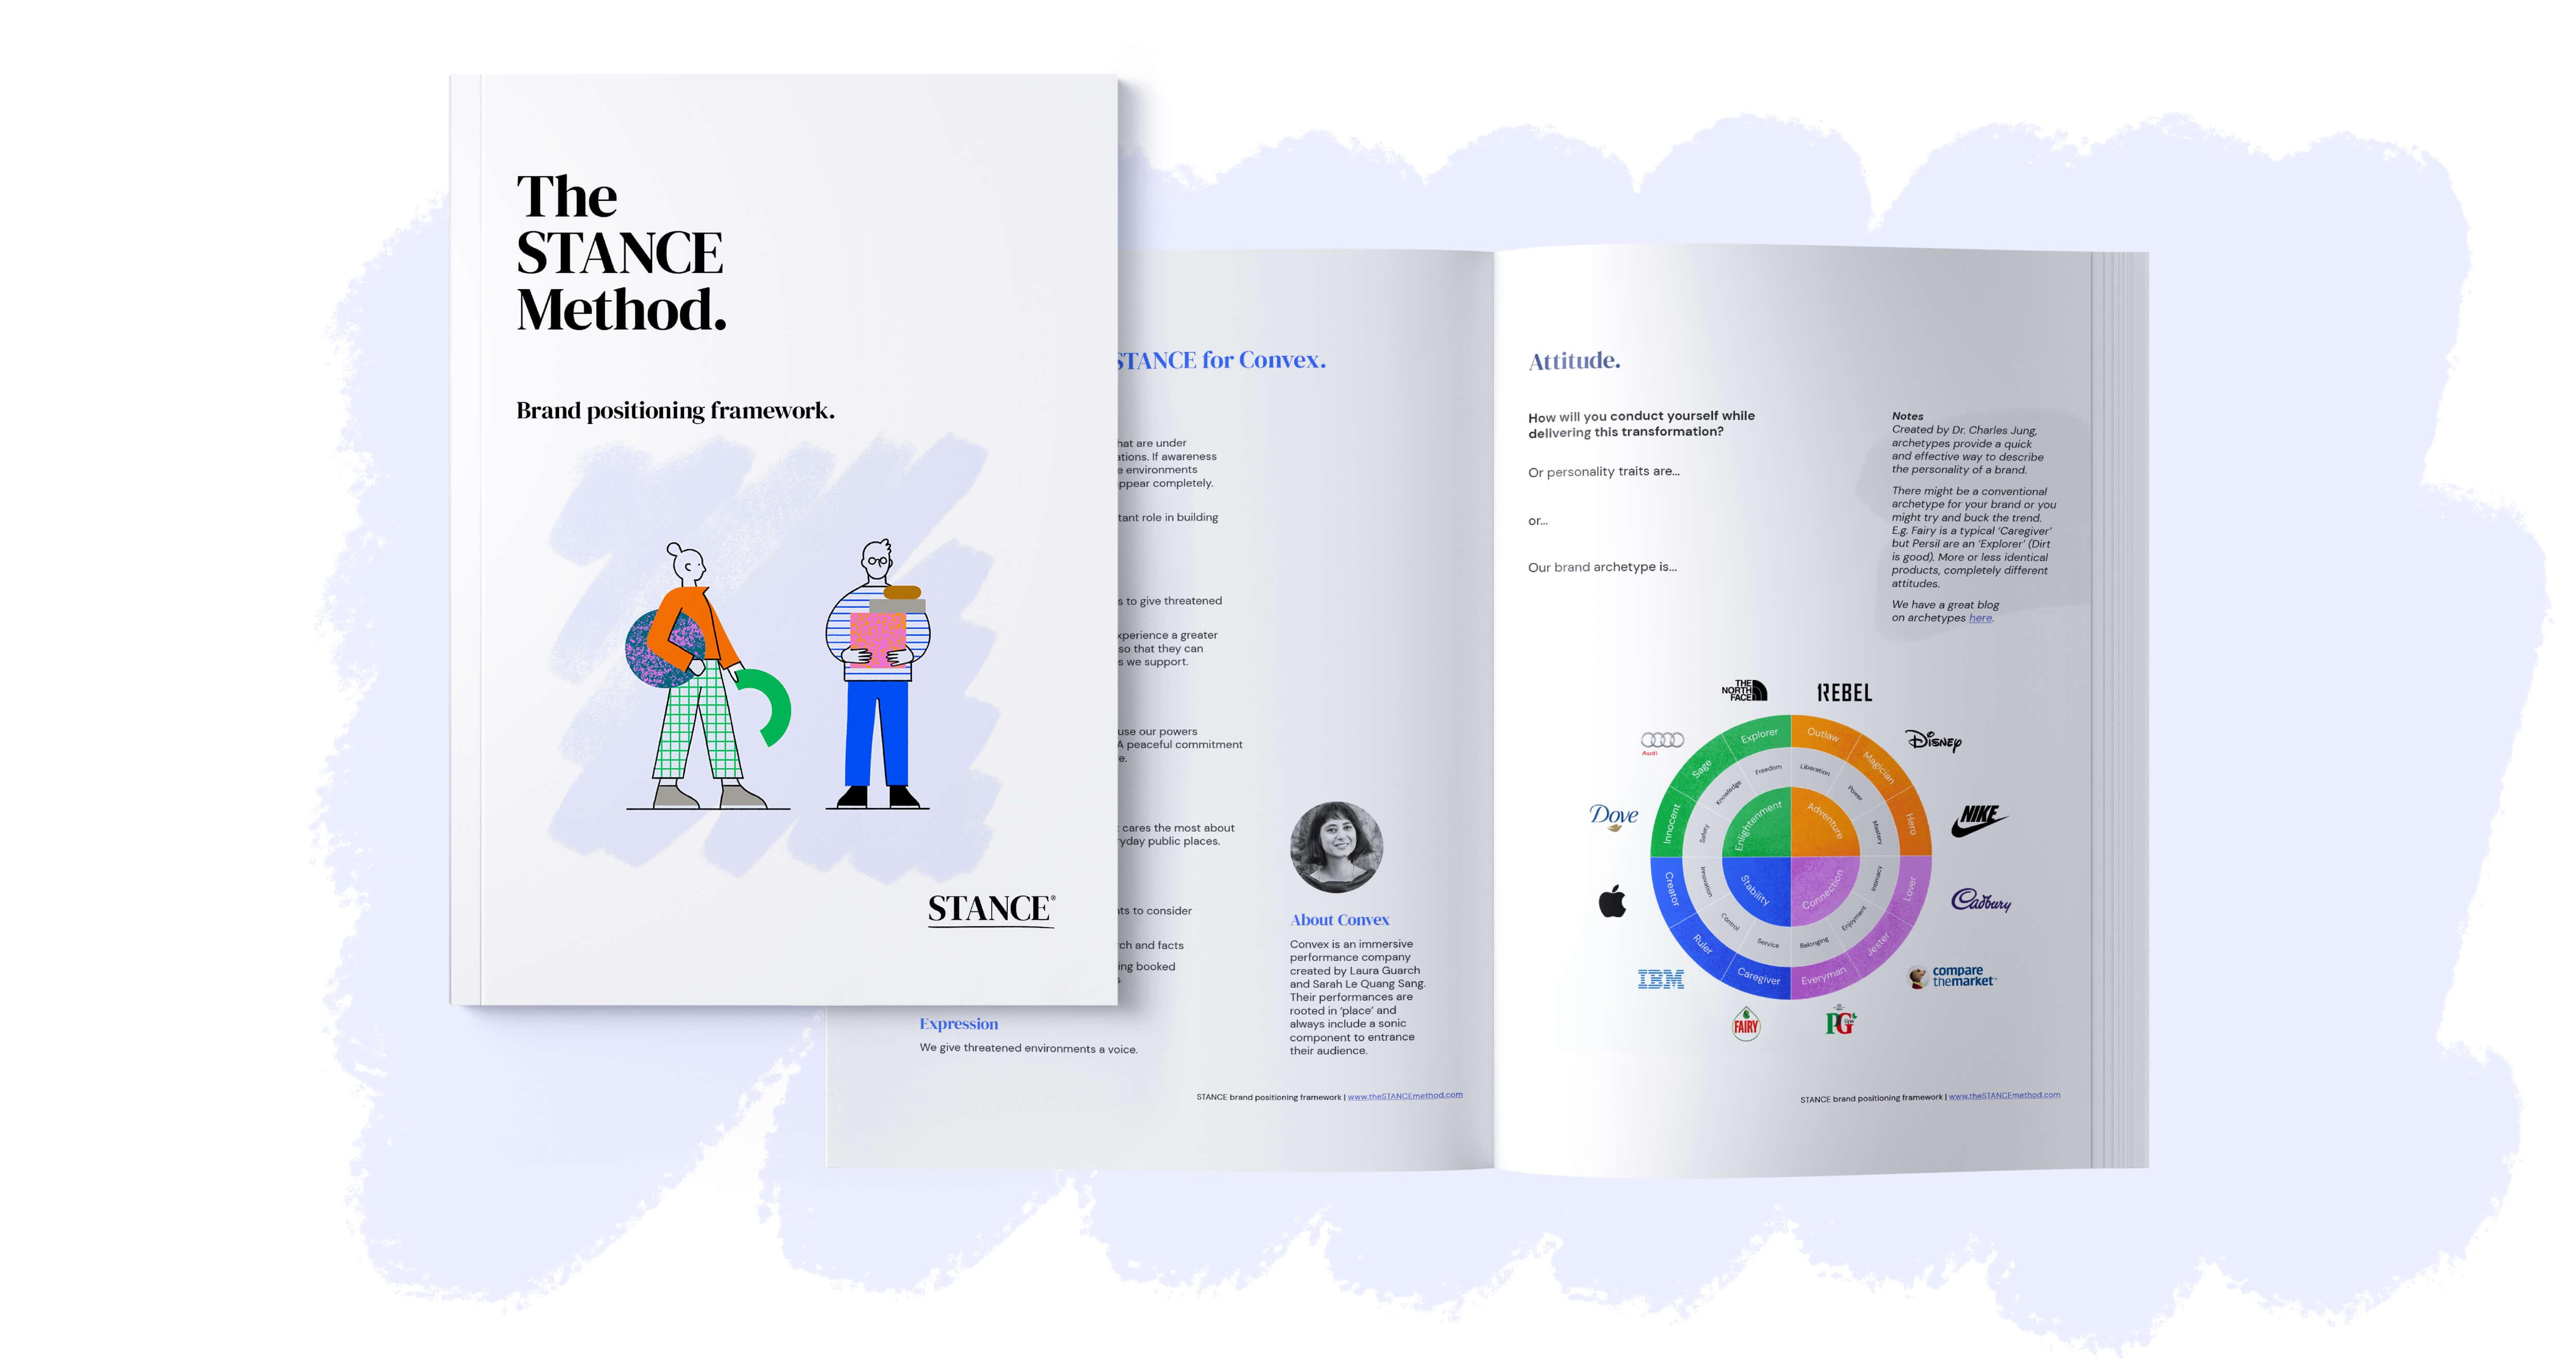 STANCE Brand positioning framework.